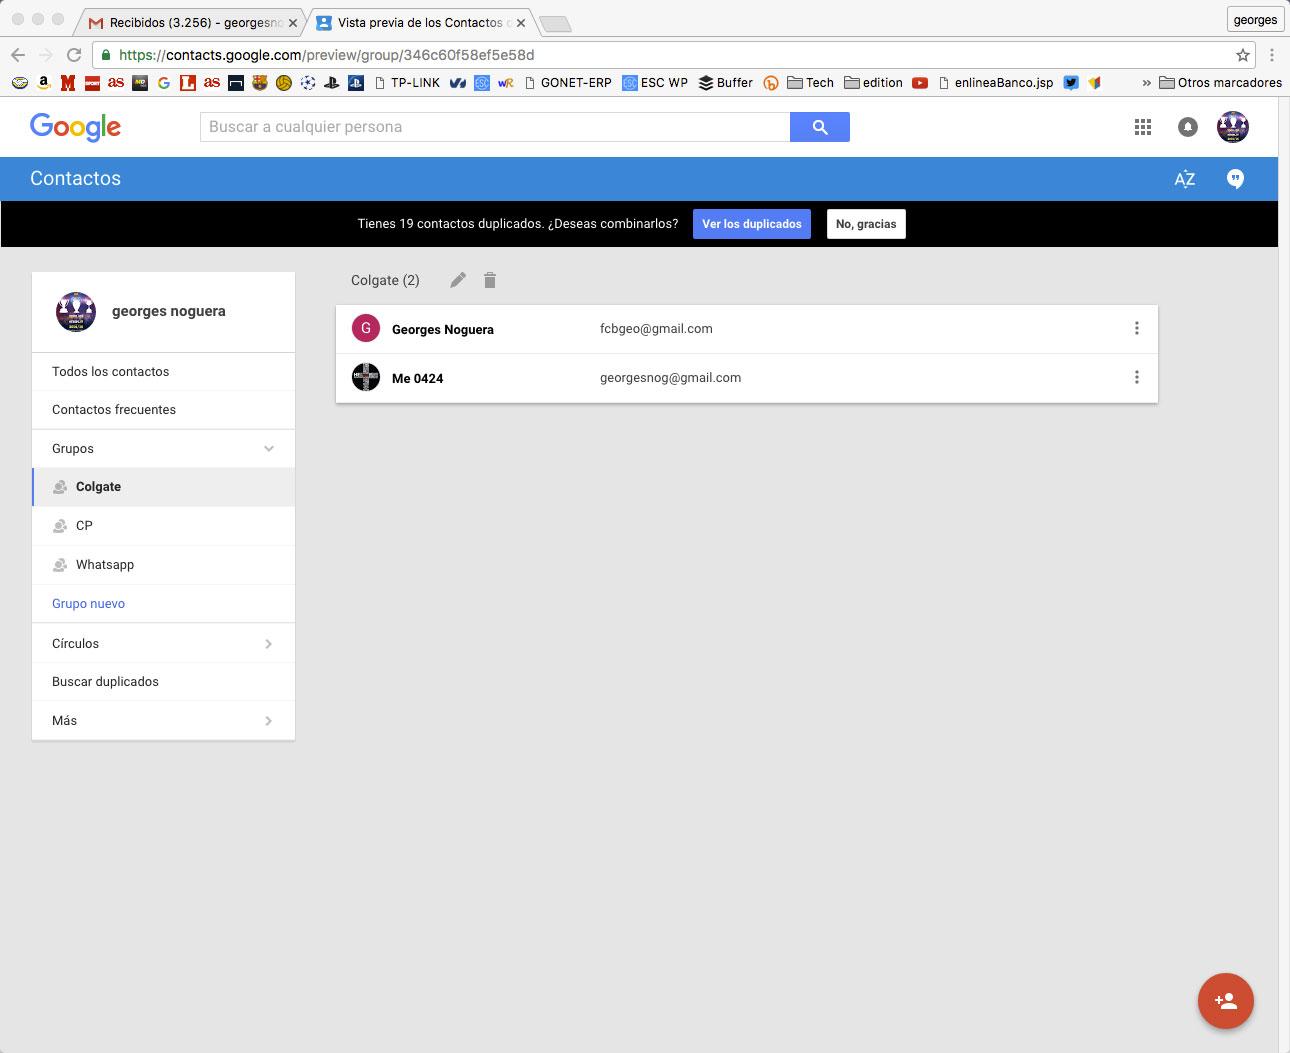 editar-grupos-de contactos en gmail